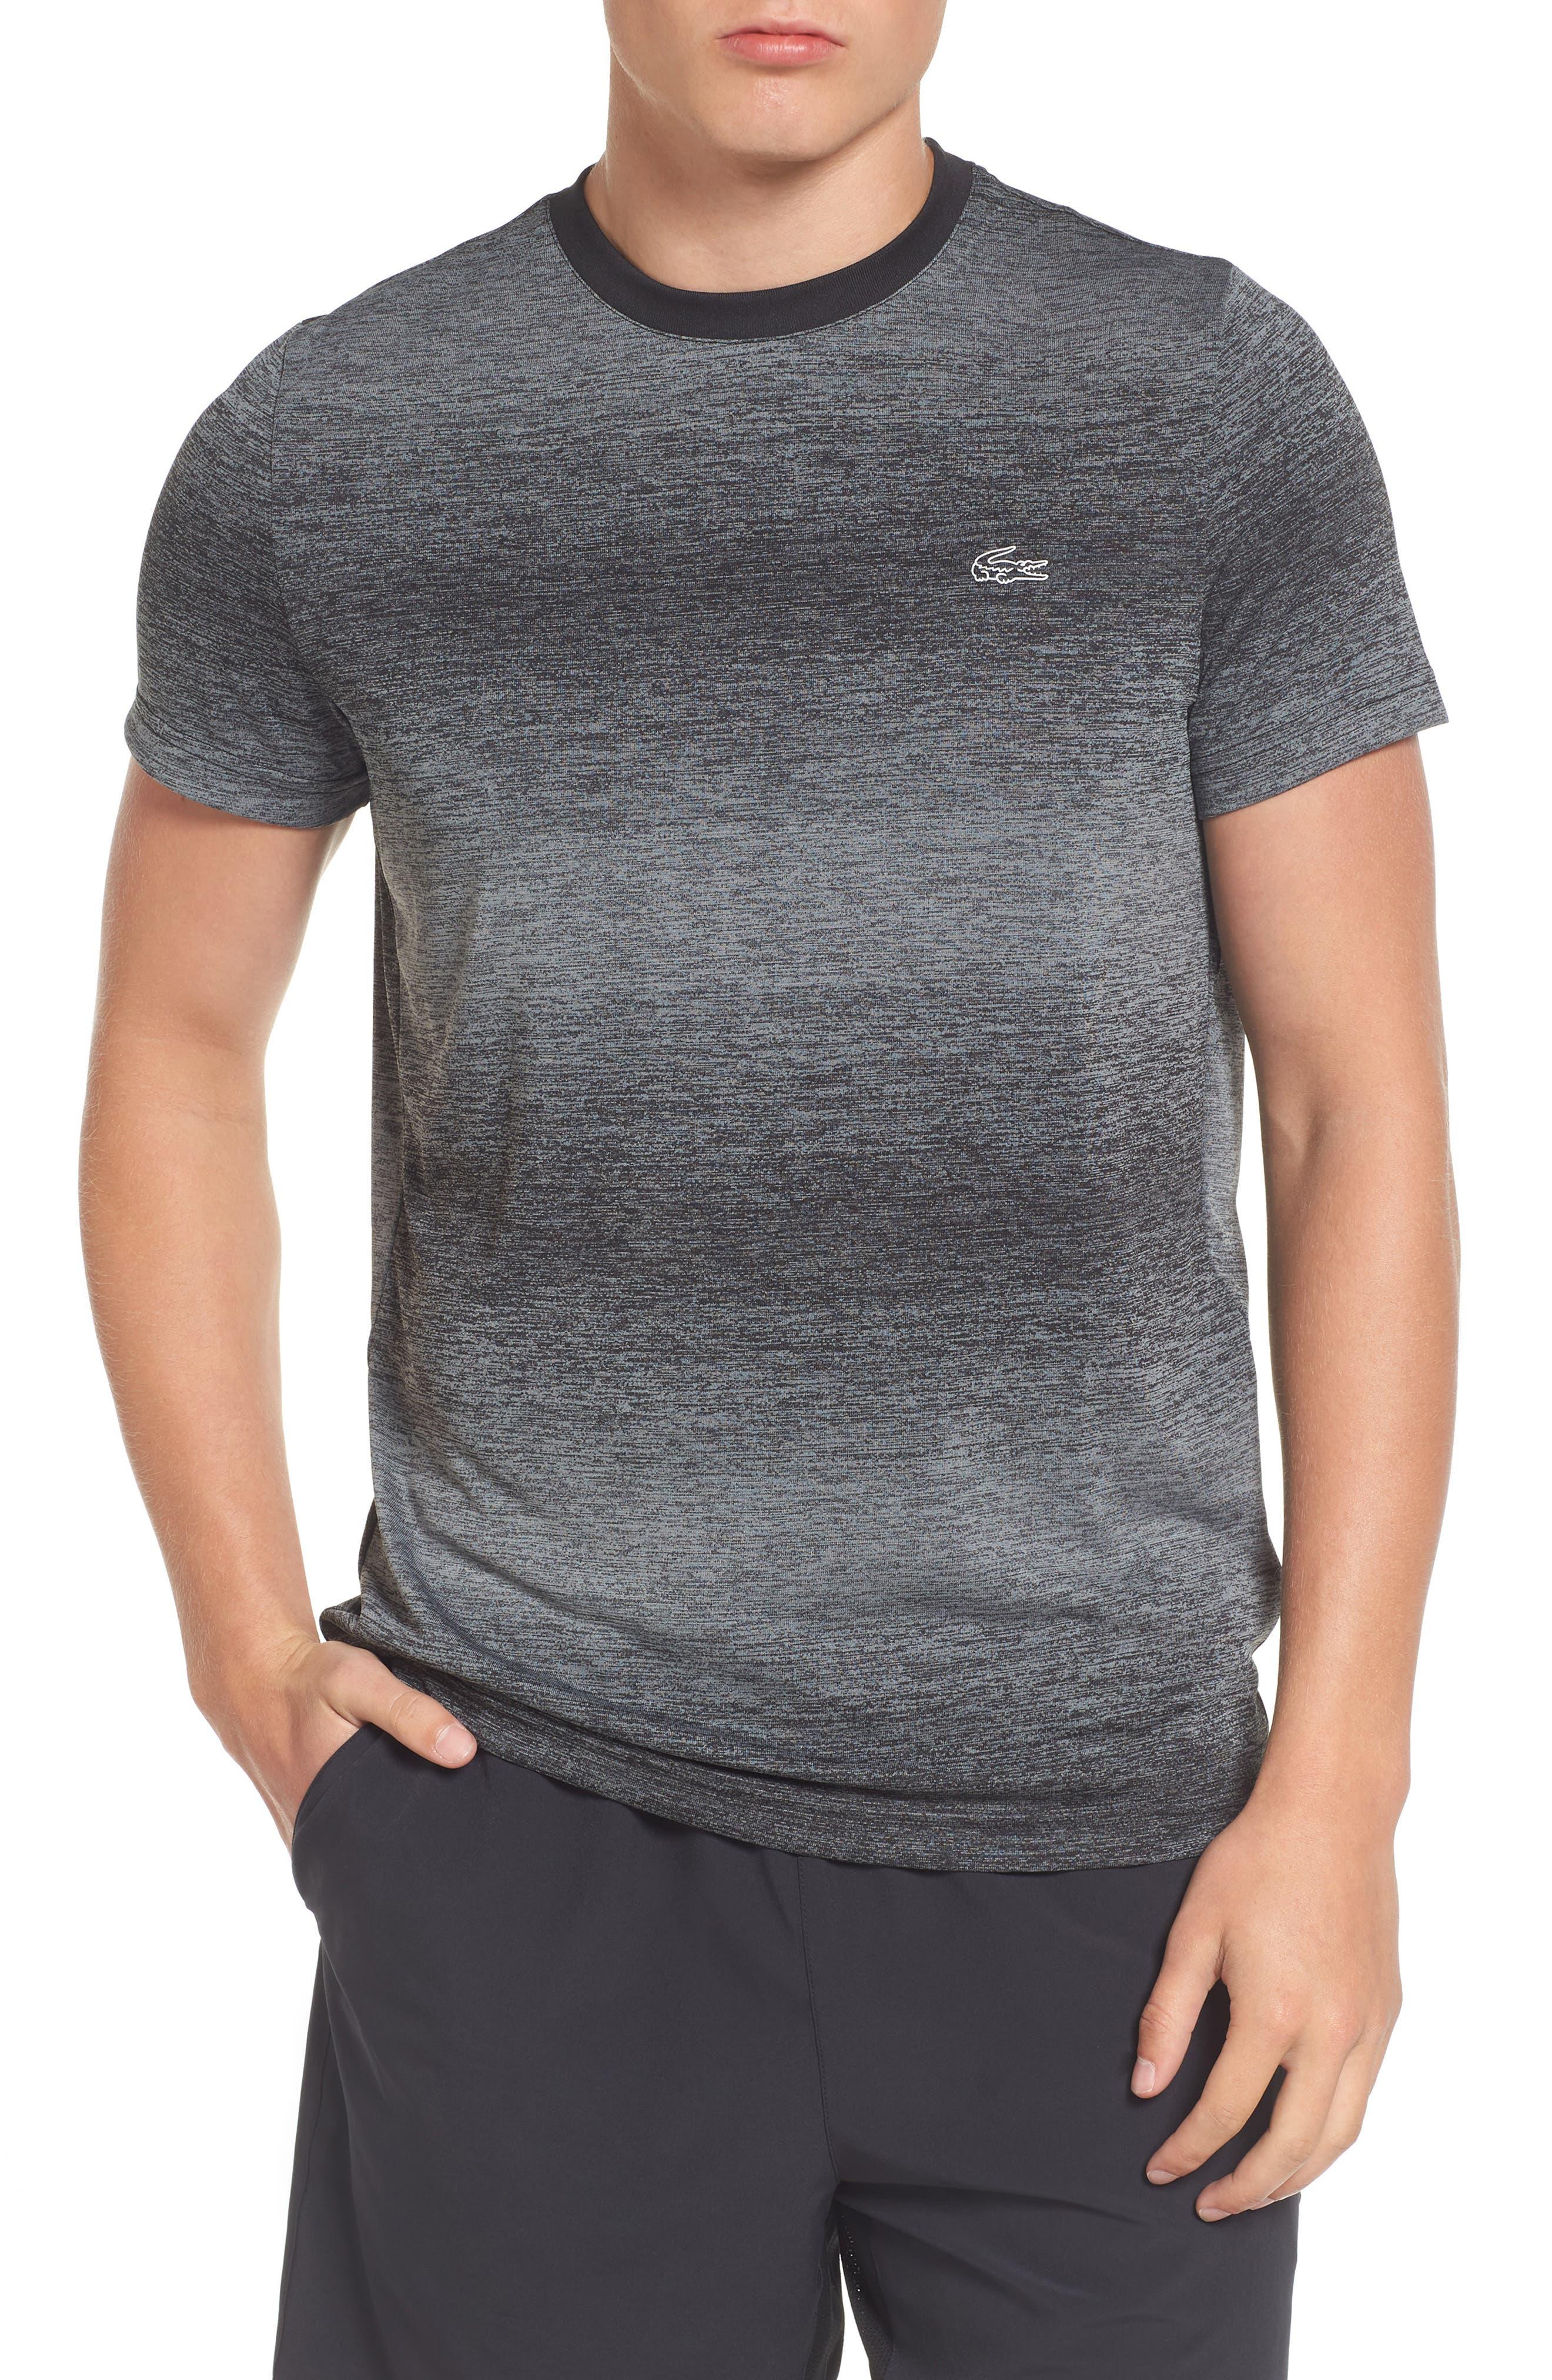 Ultra Dry Tech T-Shirt,                         Main,                         color, Rk6 Black/ Black-Copper Orange